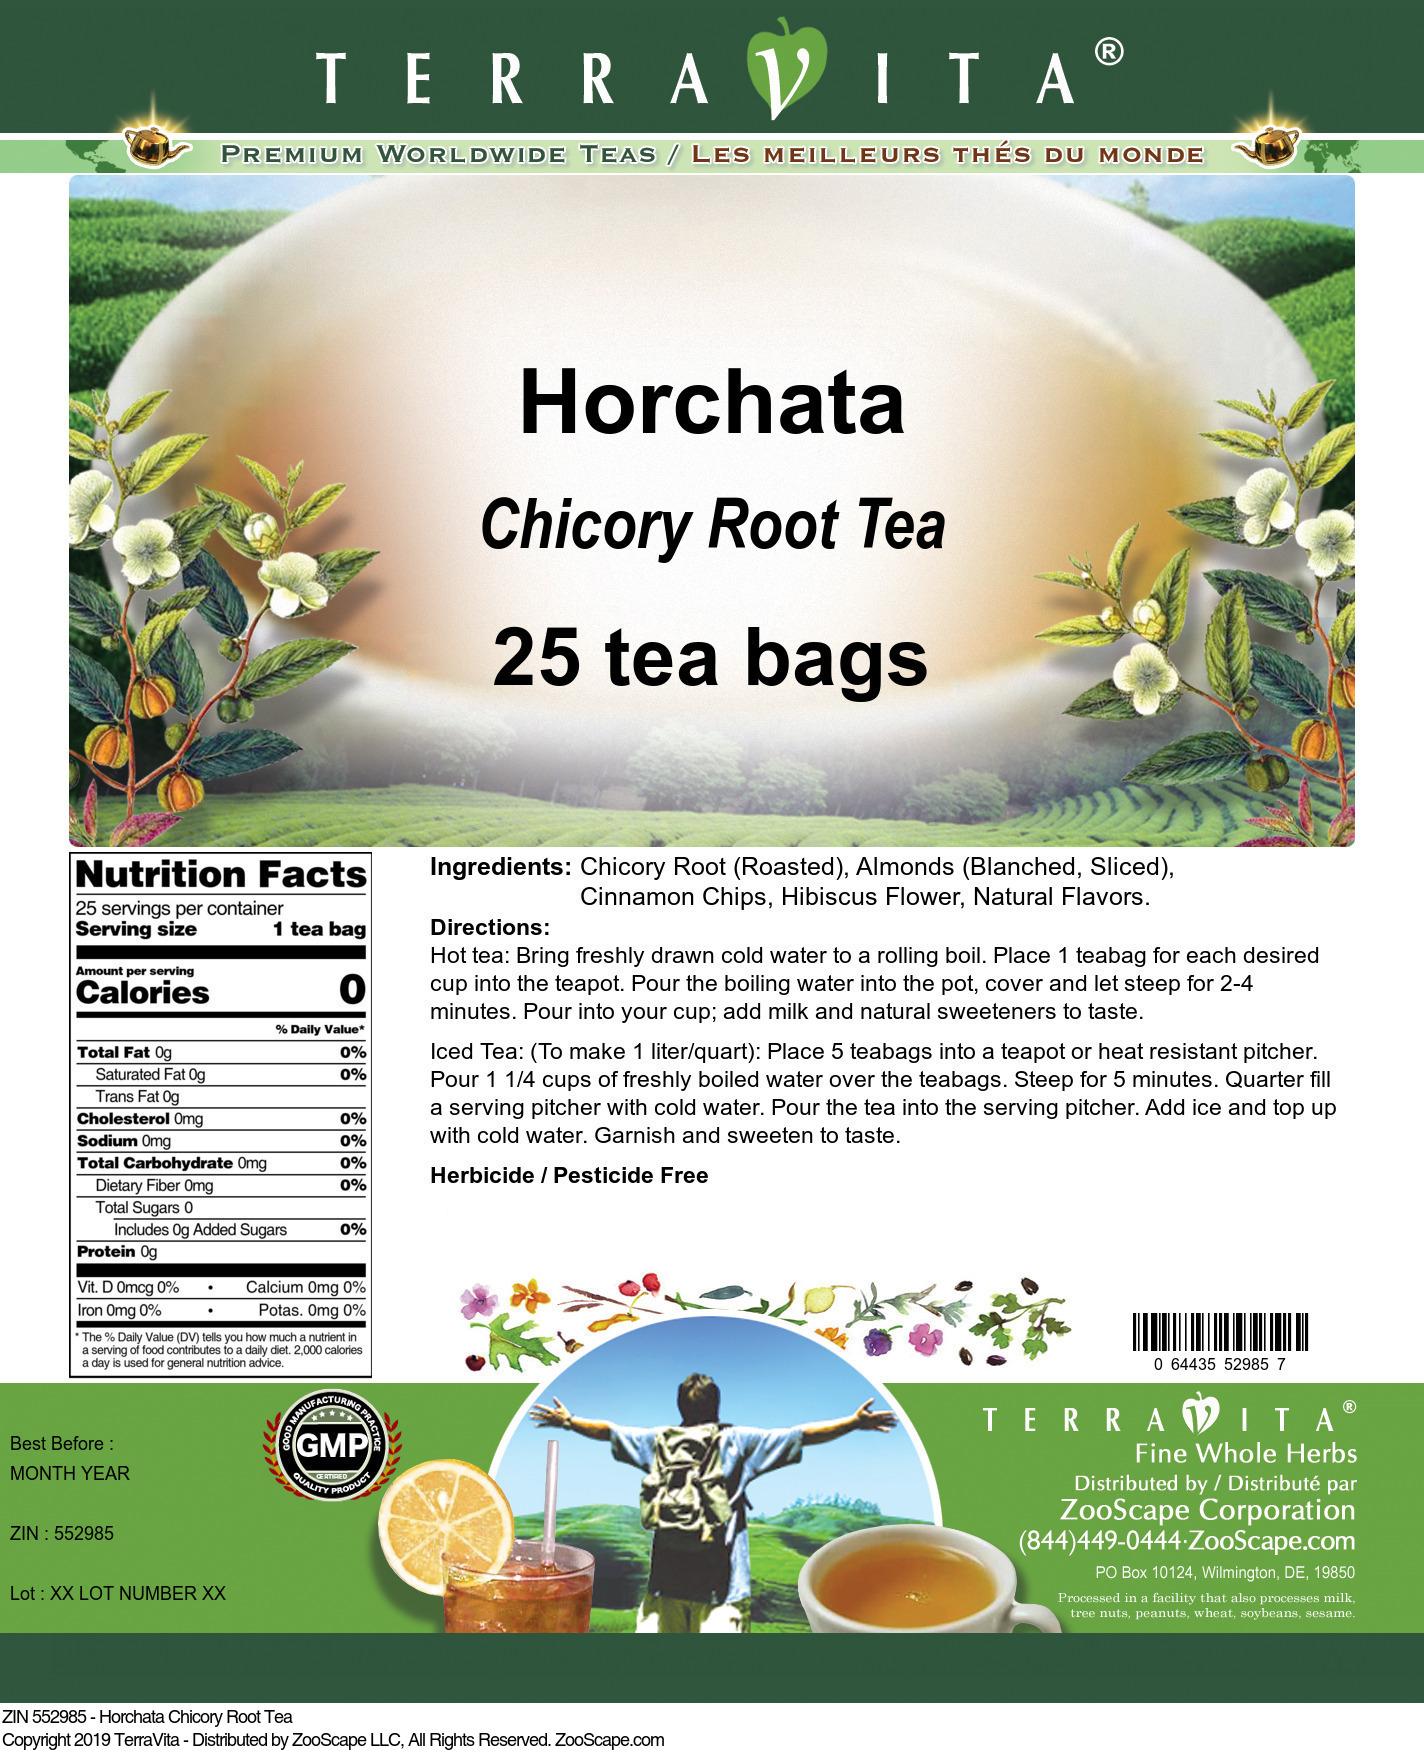 Horchata Chicory Root Tea